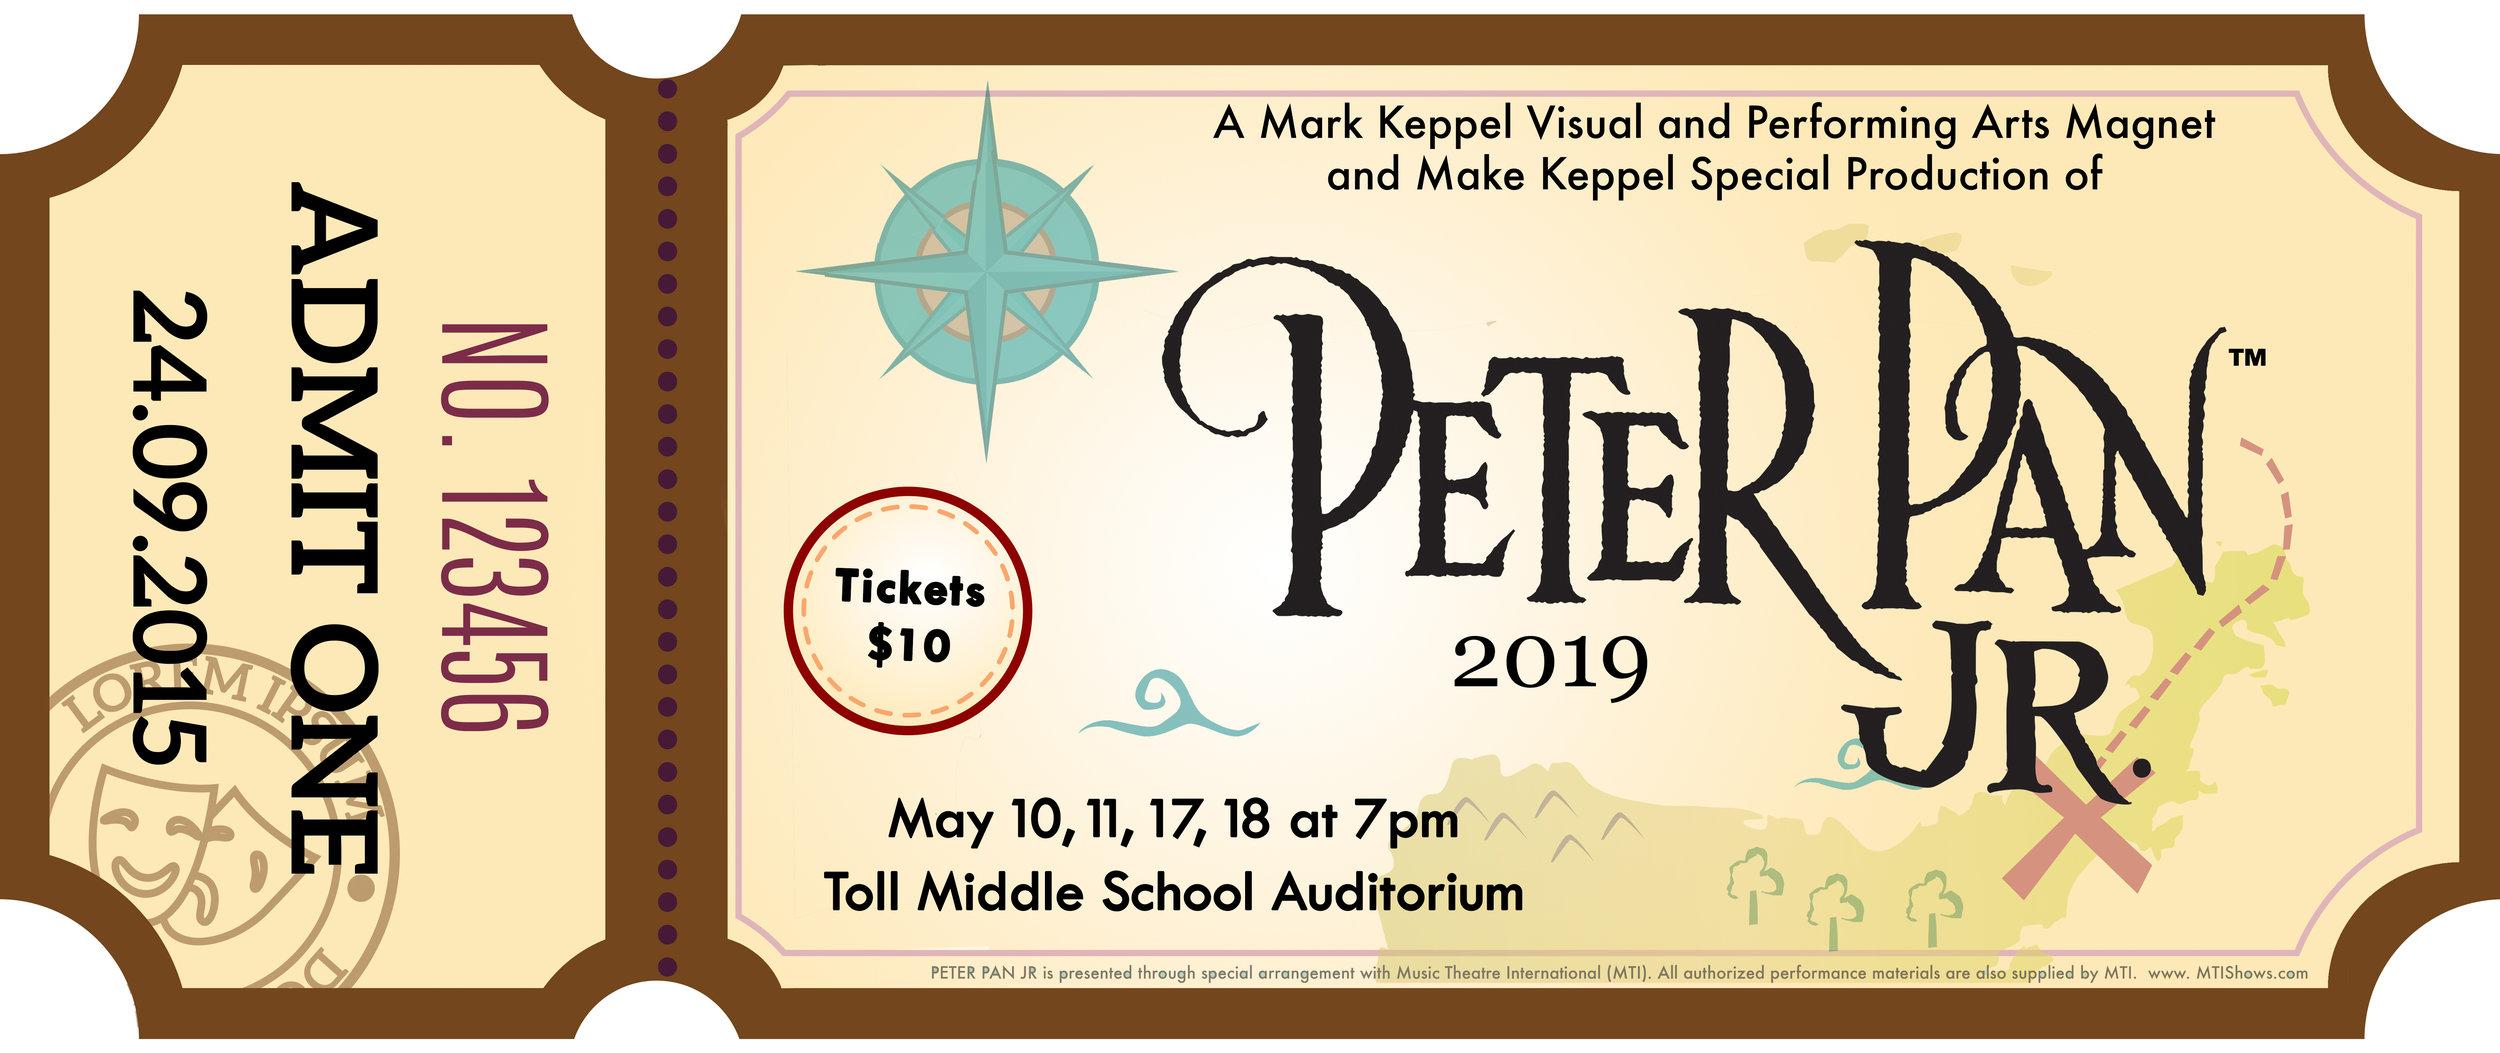 Peter Pan Jr Mock Ticket_v2.jpg